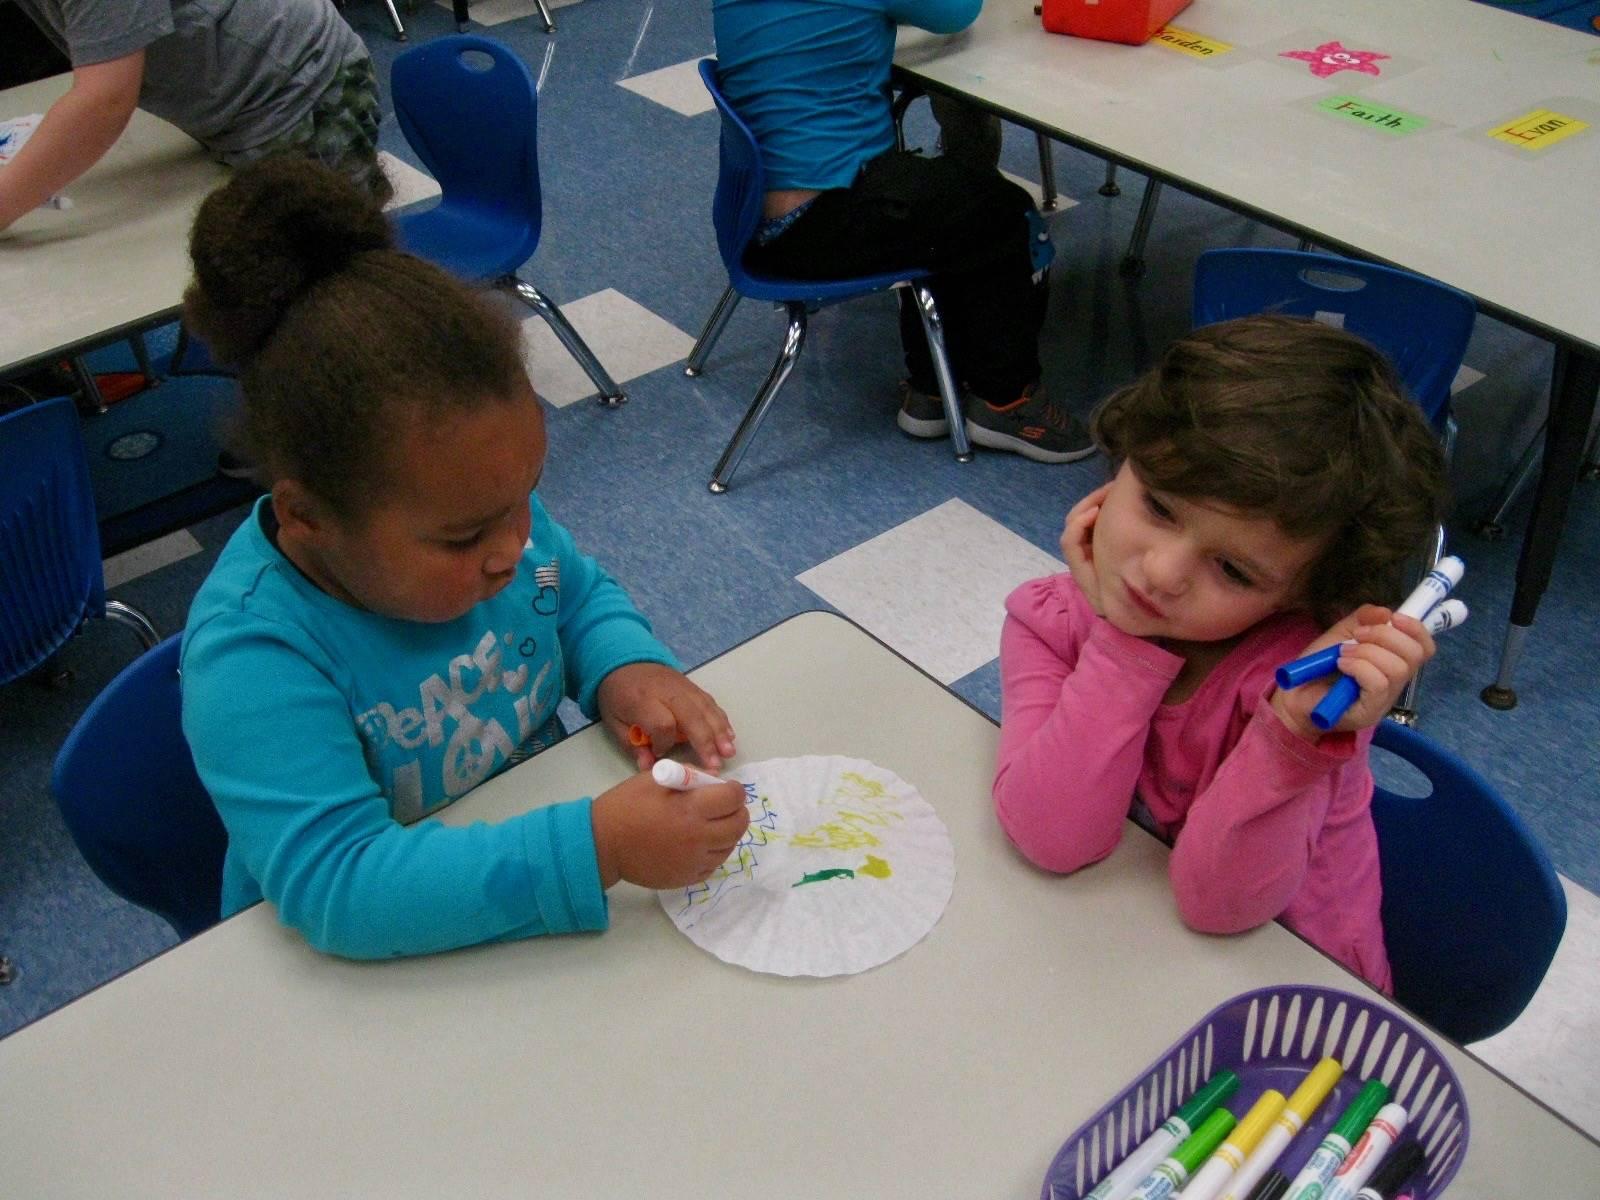 2 student color together